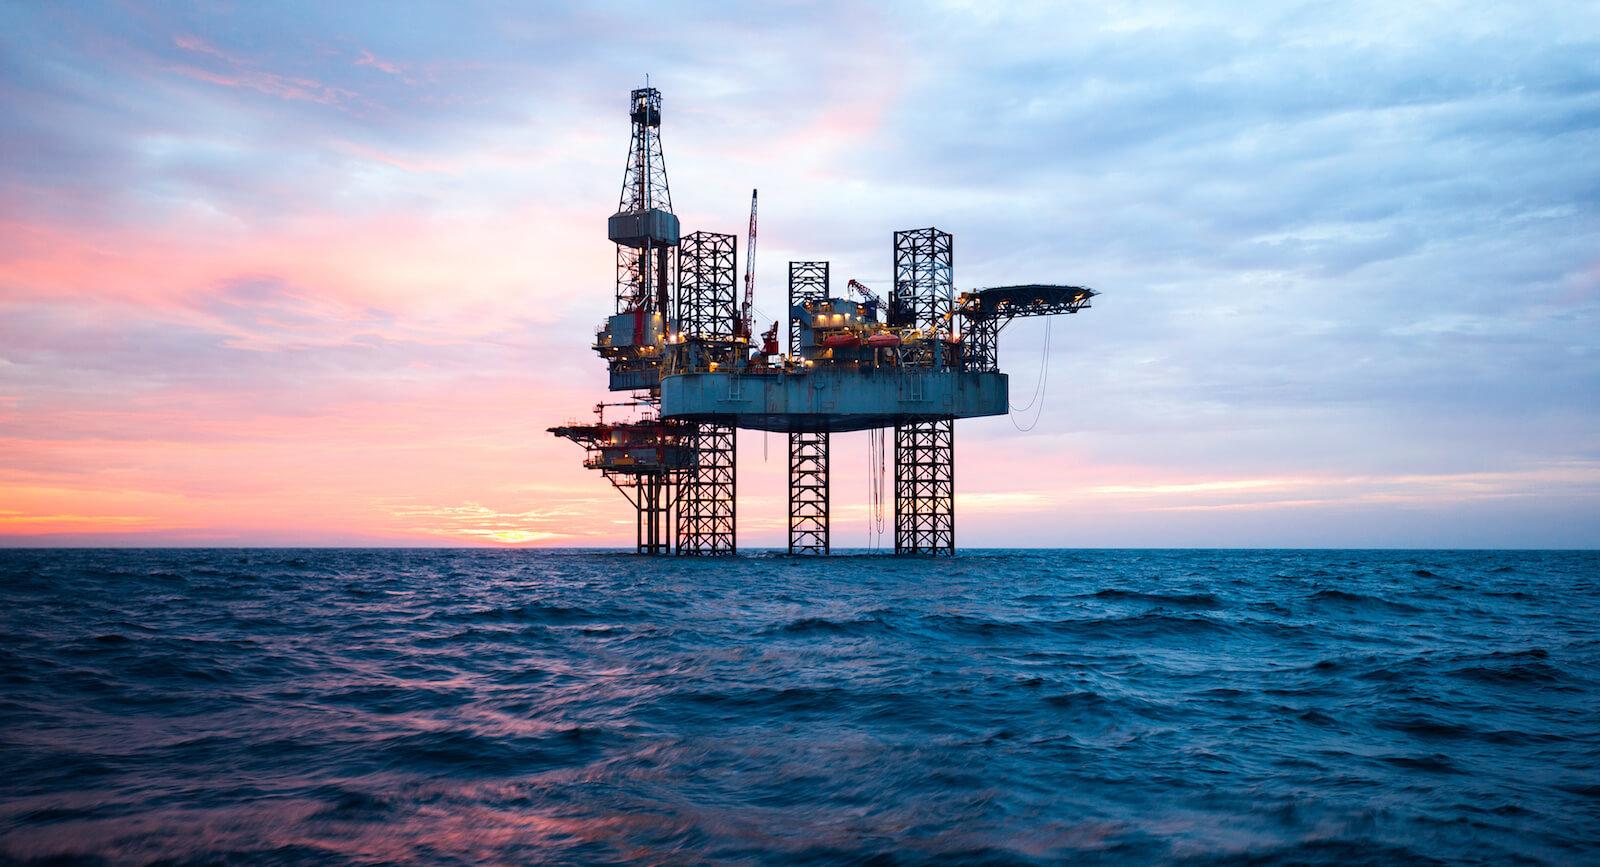 Angola Oil Rig